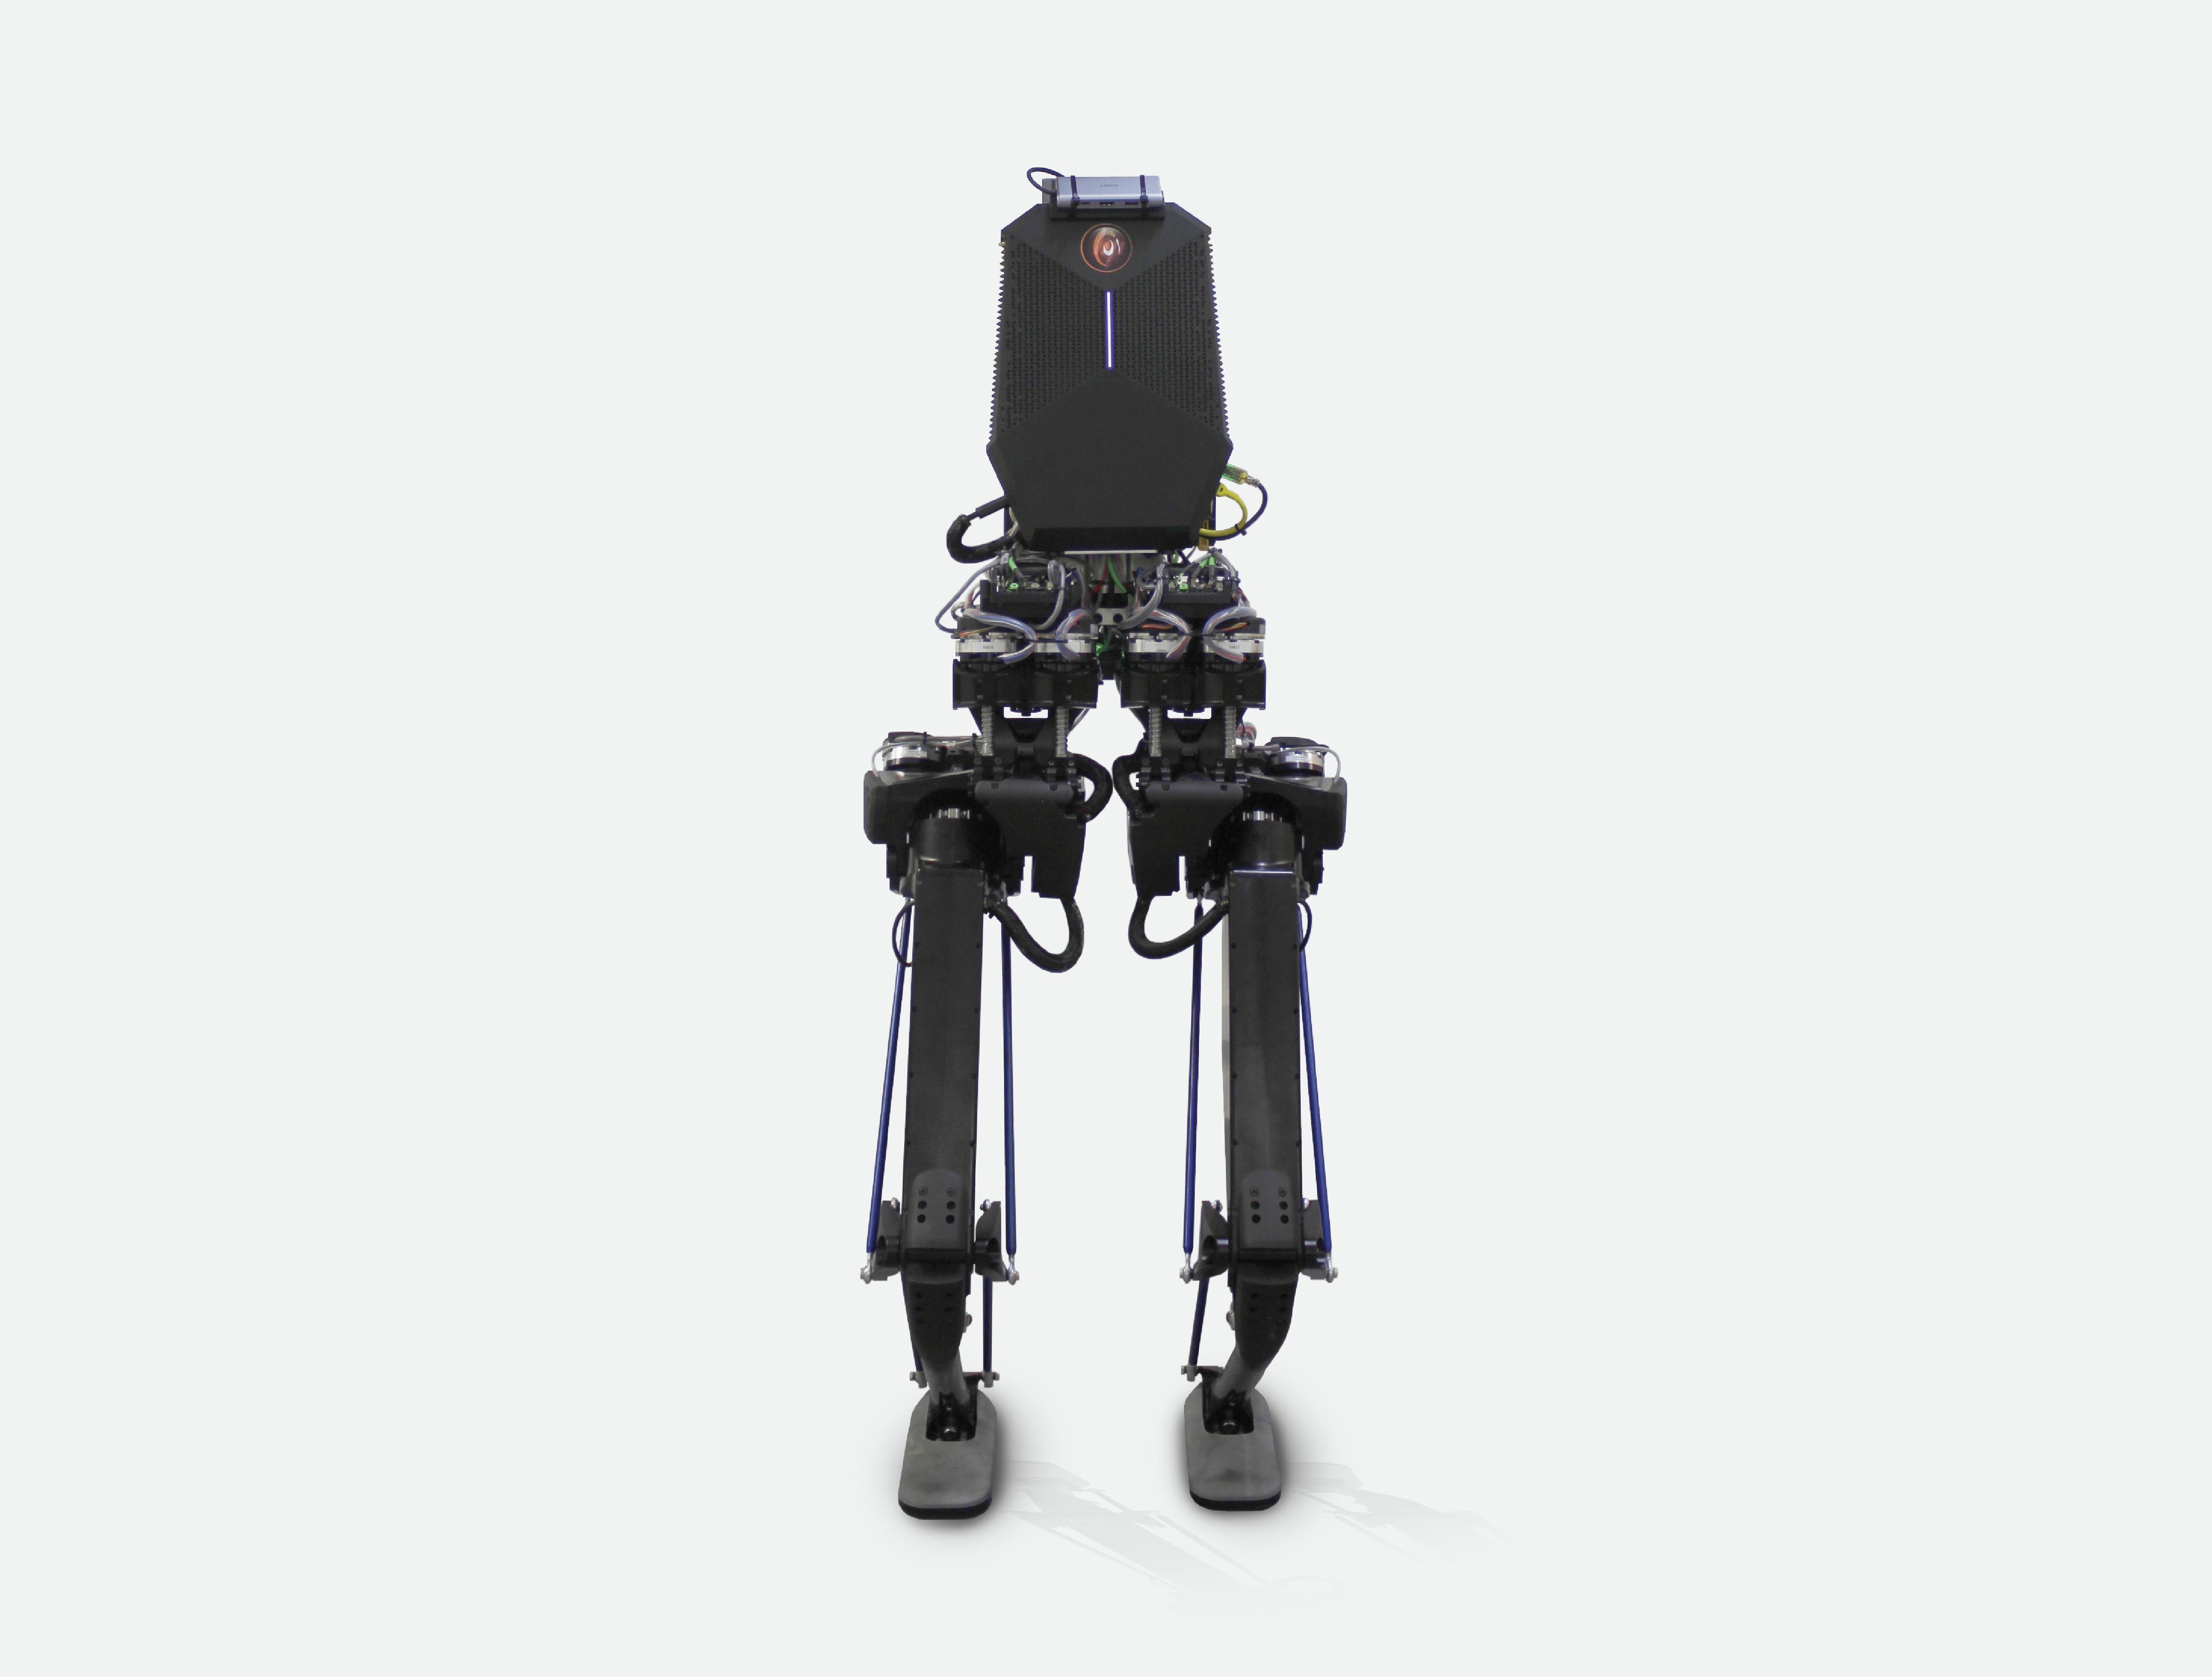 kanagroo robot by pal robotixc